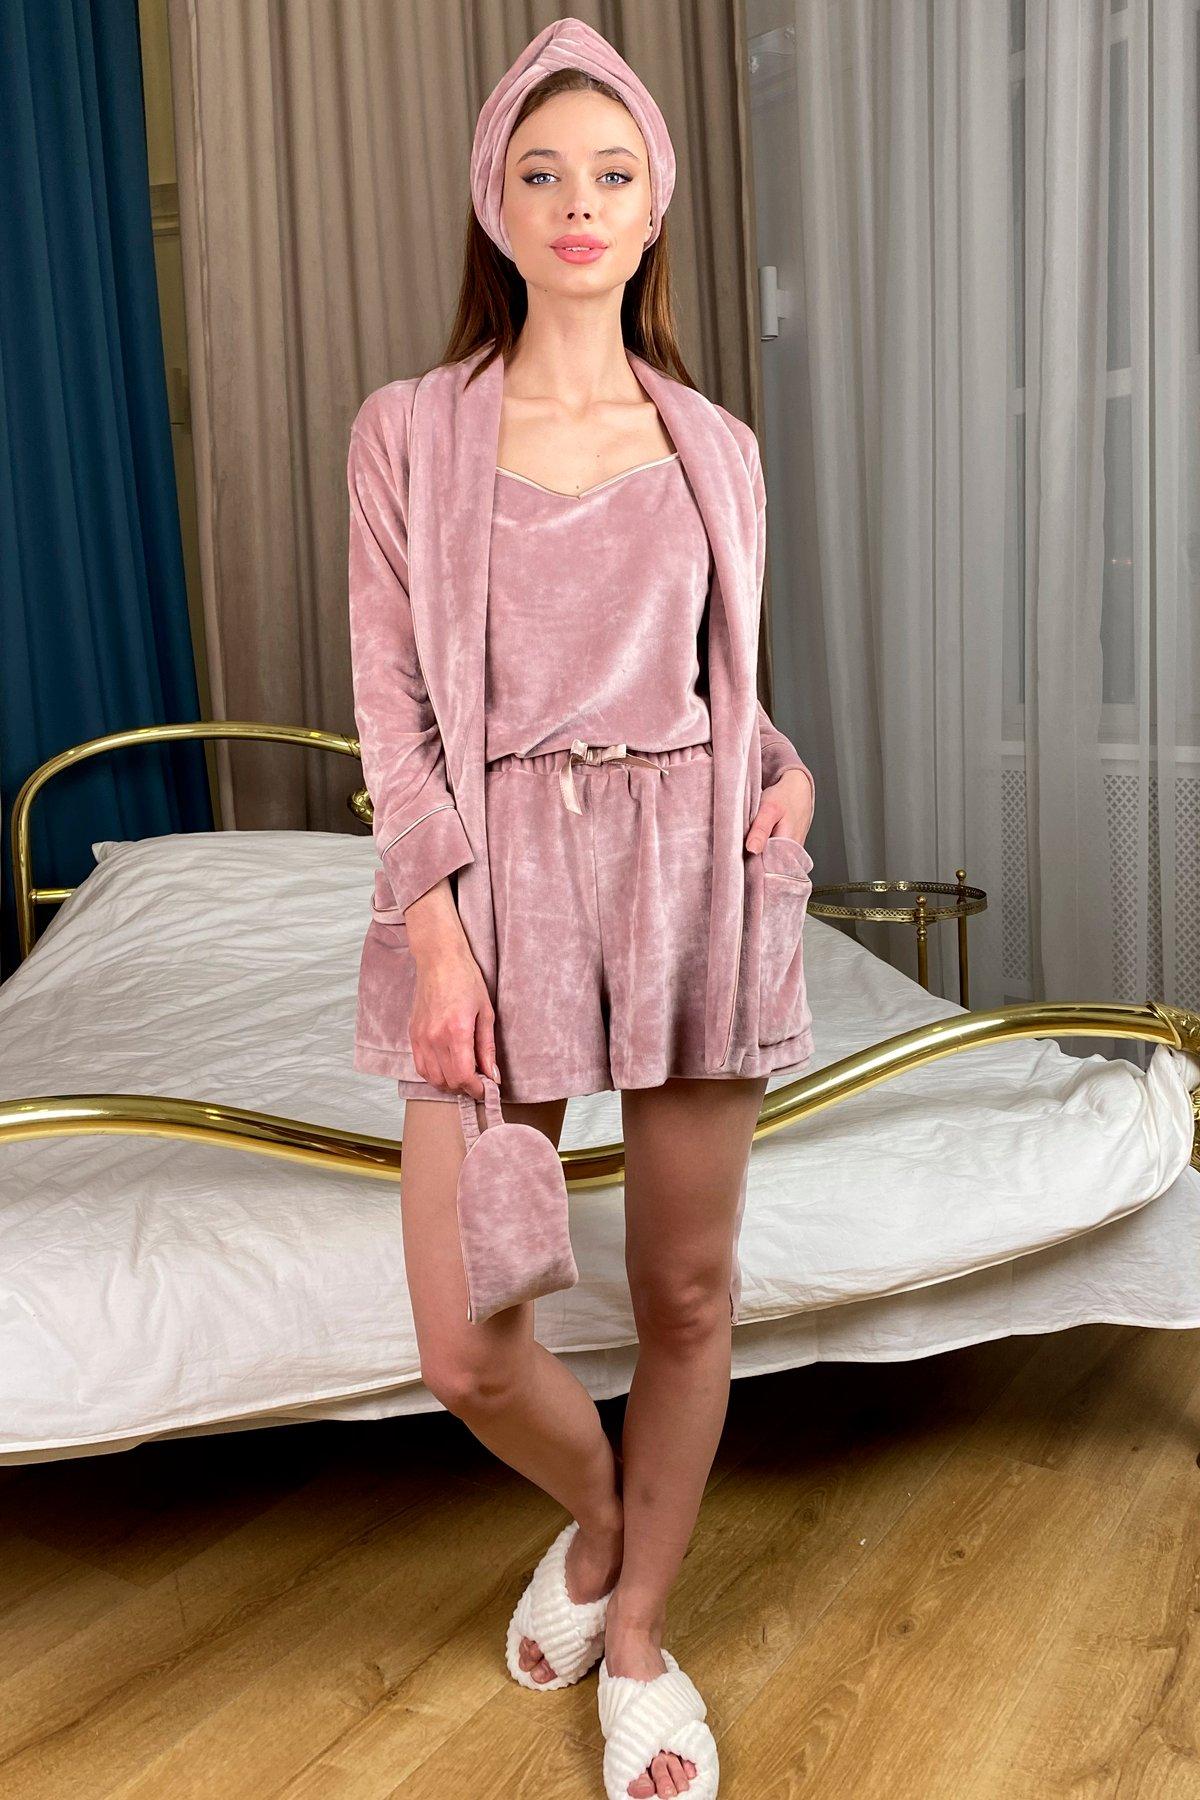 Дримс пижама велюр шорты,майка,маска для сна 10432 АРТ. 46744 Цвет: Пудра/бежевый - фото 1, интернет магазин tm-modus.ru